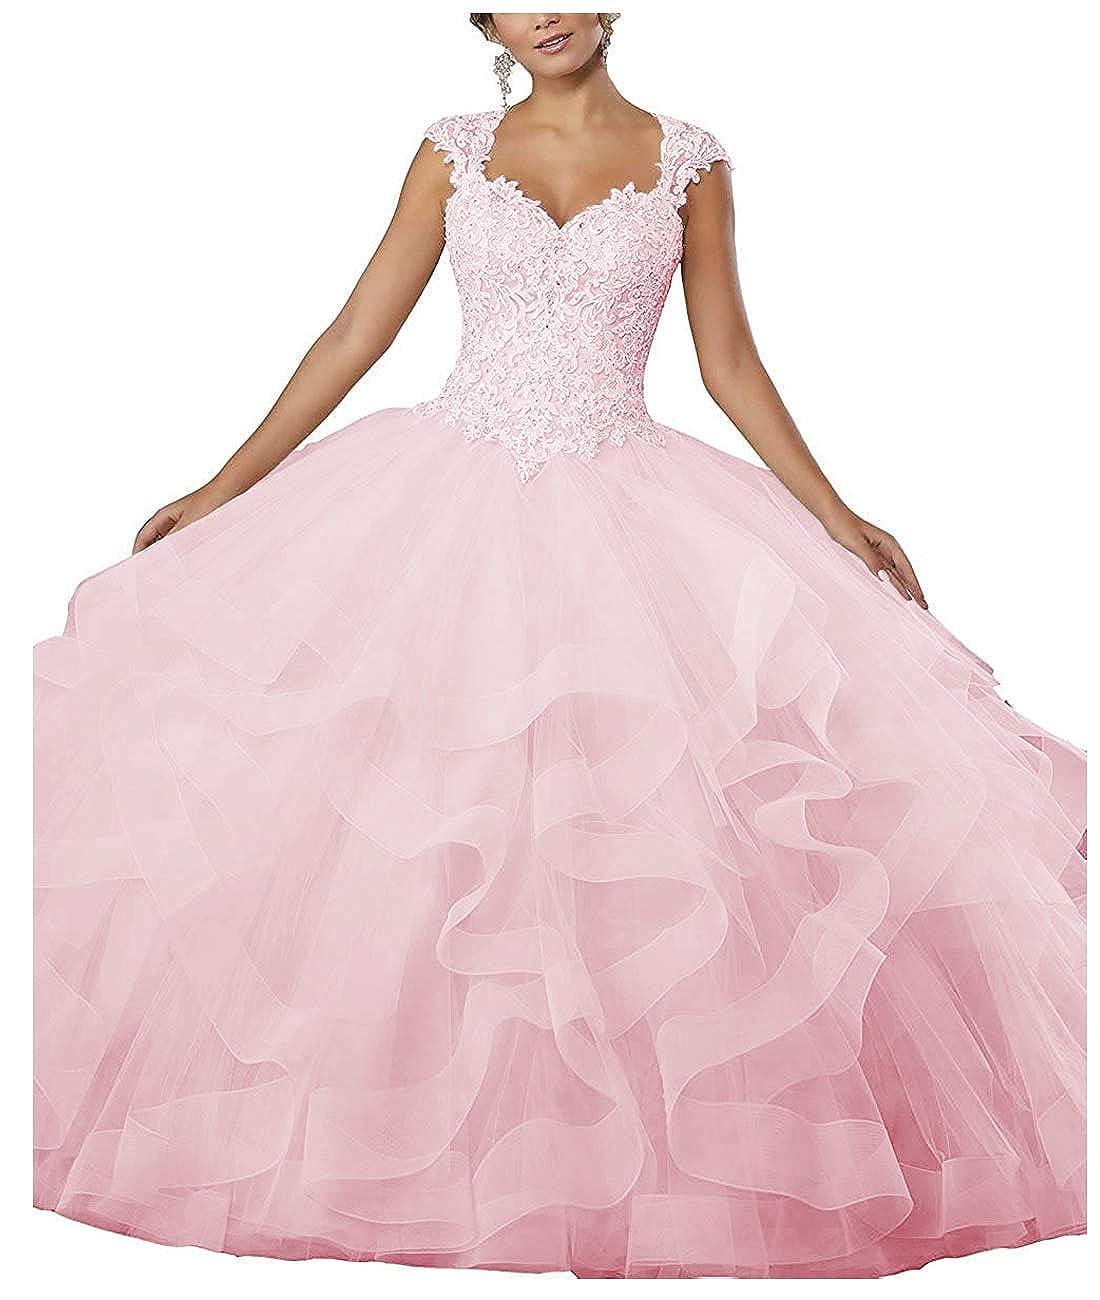 Light Pink ZLQQ Women's Sweet 16 Lace Applique Beading Sleeveless Ball Gown Quinceanera Dresses